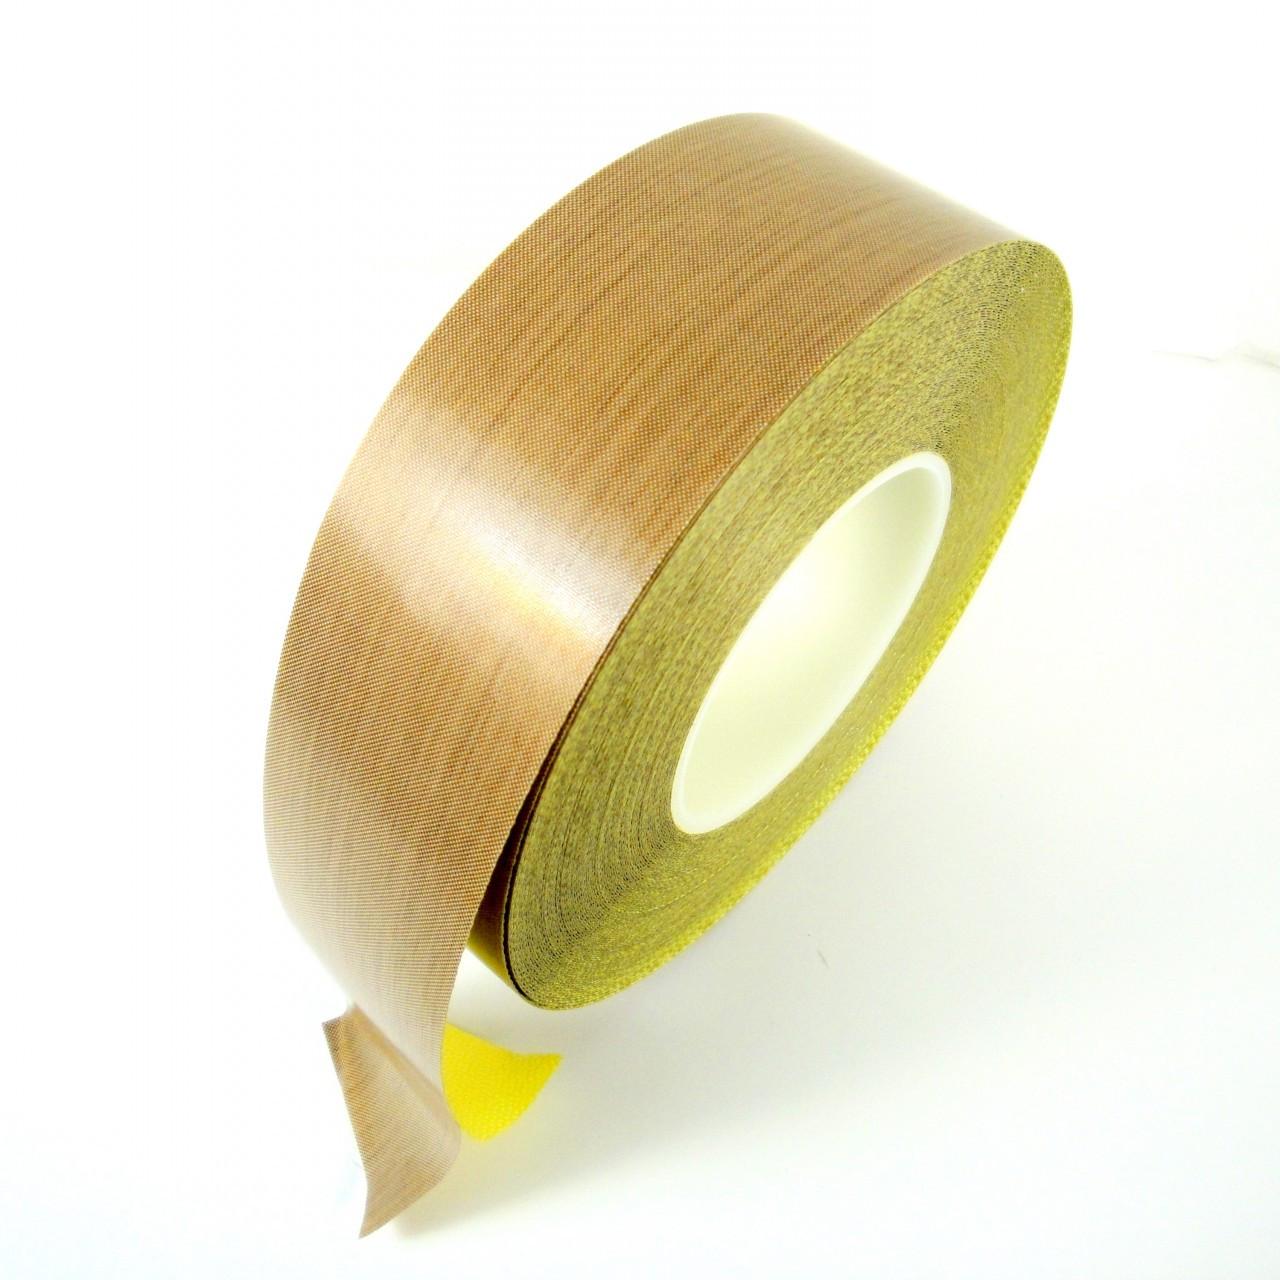 1//2 inch x 36 yards Teflon 5 mil w// Silicone Adhesive Coated Fiberglass Cloth Tape PTFE